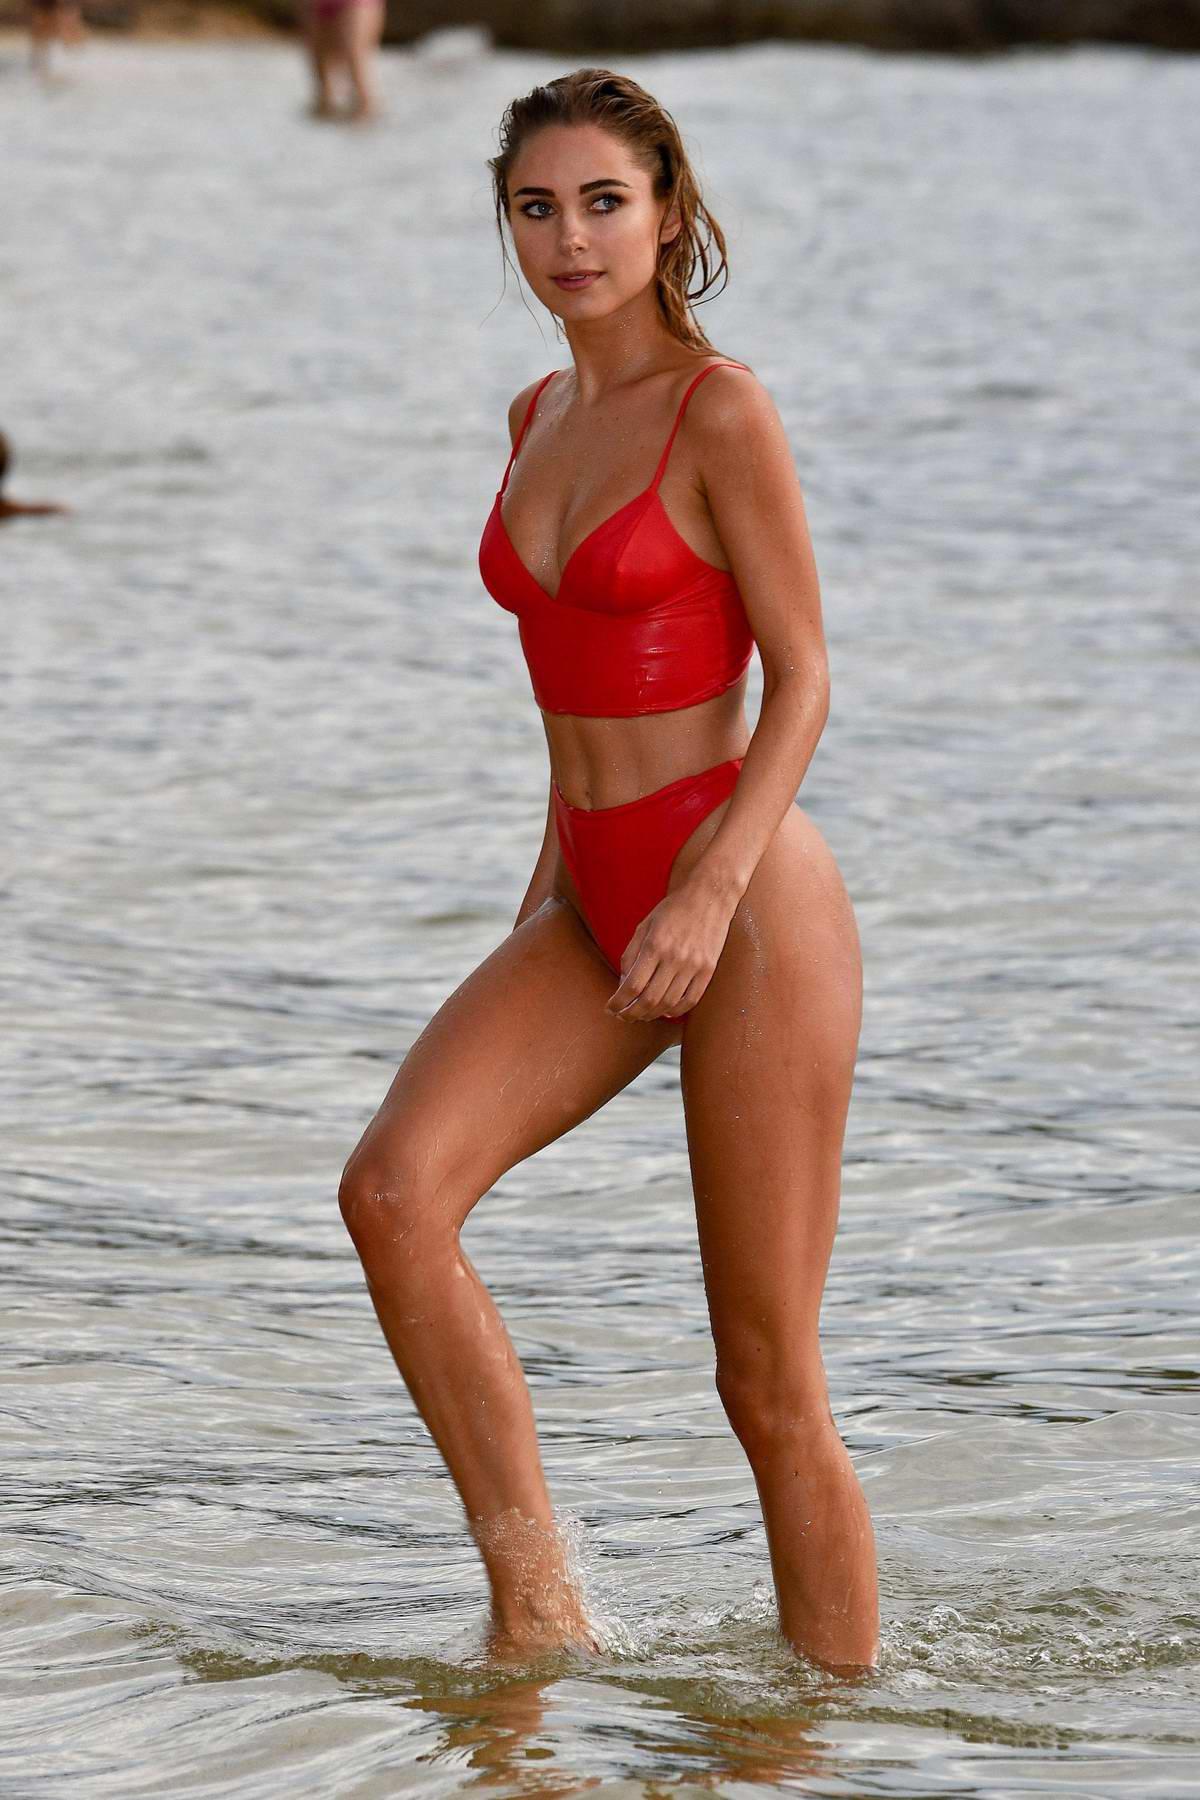 Kimberley Garner in a red bikini enjoys some paddle-boarding in Caribbean